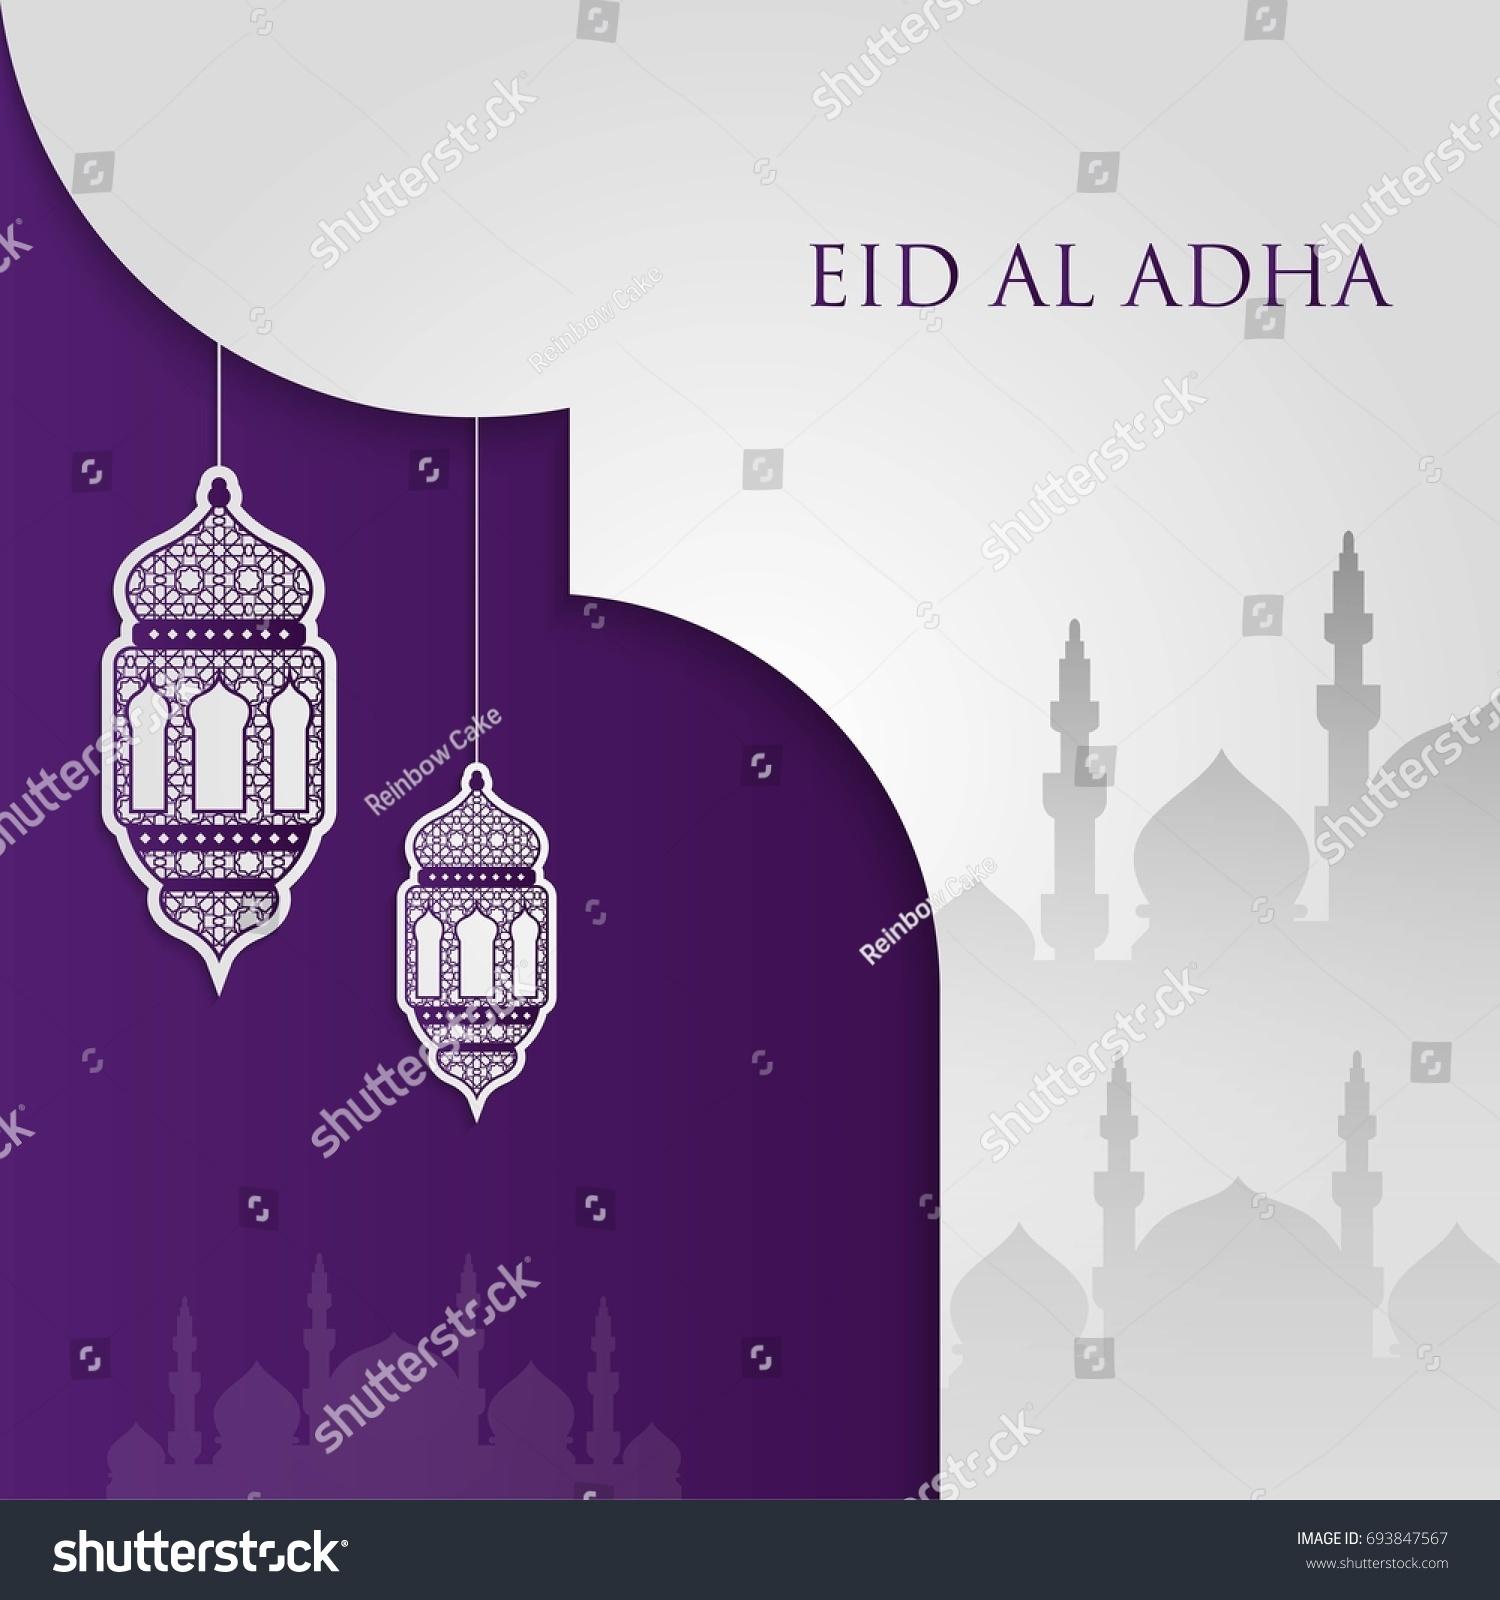 Eid Mubarak Eid Al Adha Template Stock Vector Royalty Free 693847567